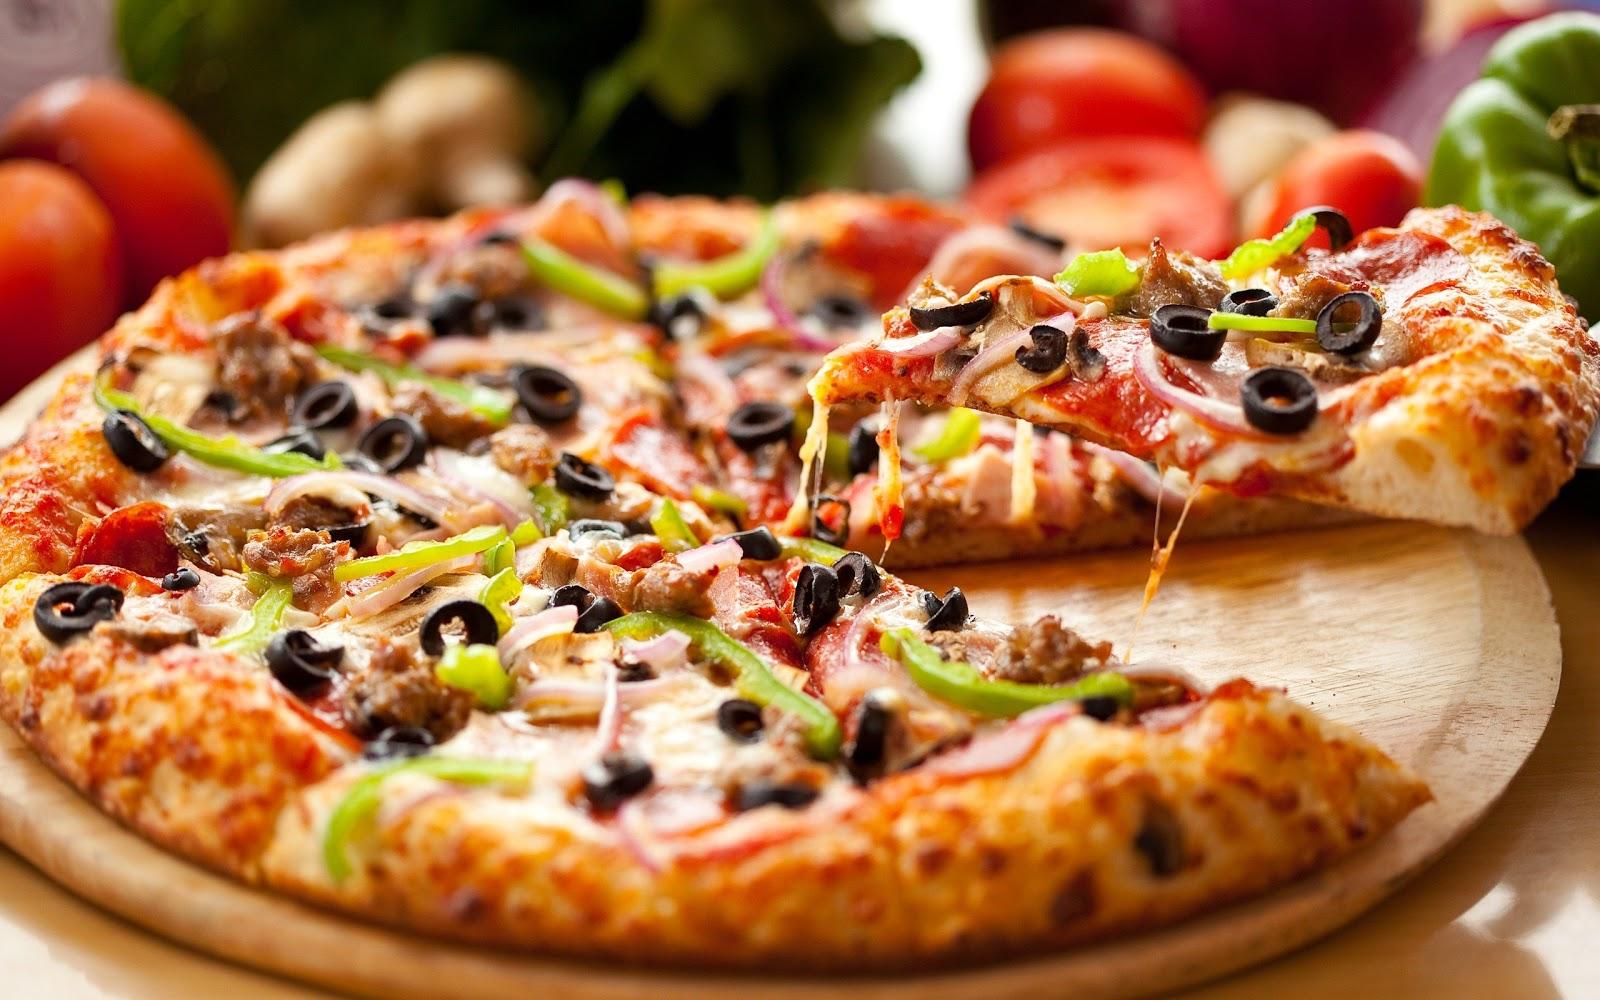 https://2.bp.blogspot.com/-3prY4nlI4r4/V4t-SND5PRI/AAAAAAAASmU/Eg7-sVT0WeEvVGtKFwk_IC_qA41Mk61cQCLcB/s1600/pizza-stock.jpg